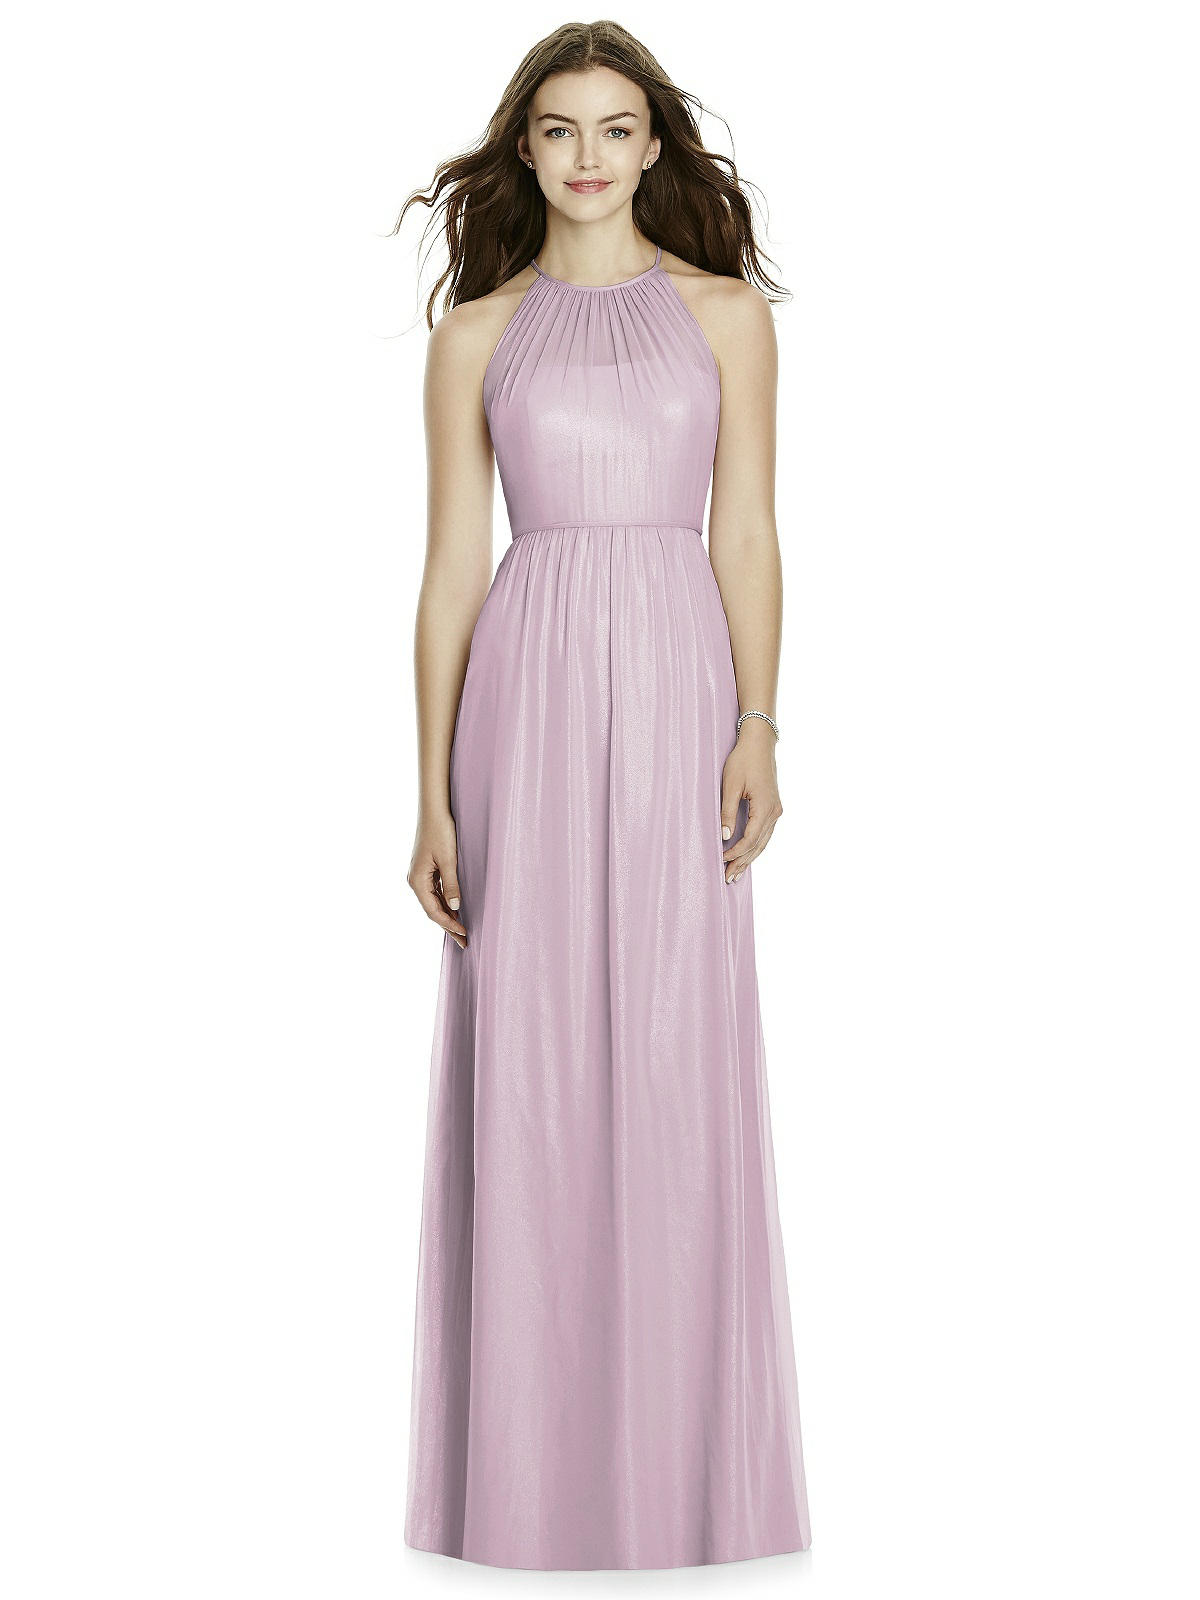 Bb100 ls bella bridesmaids shop dresses share on facebook tweet this dress pin it ombrellifo Images